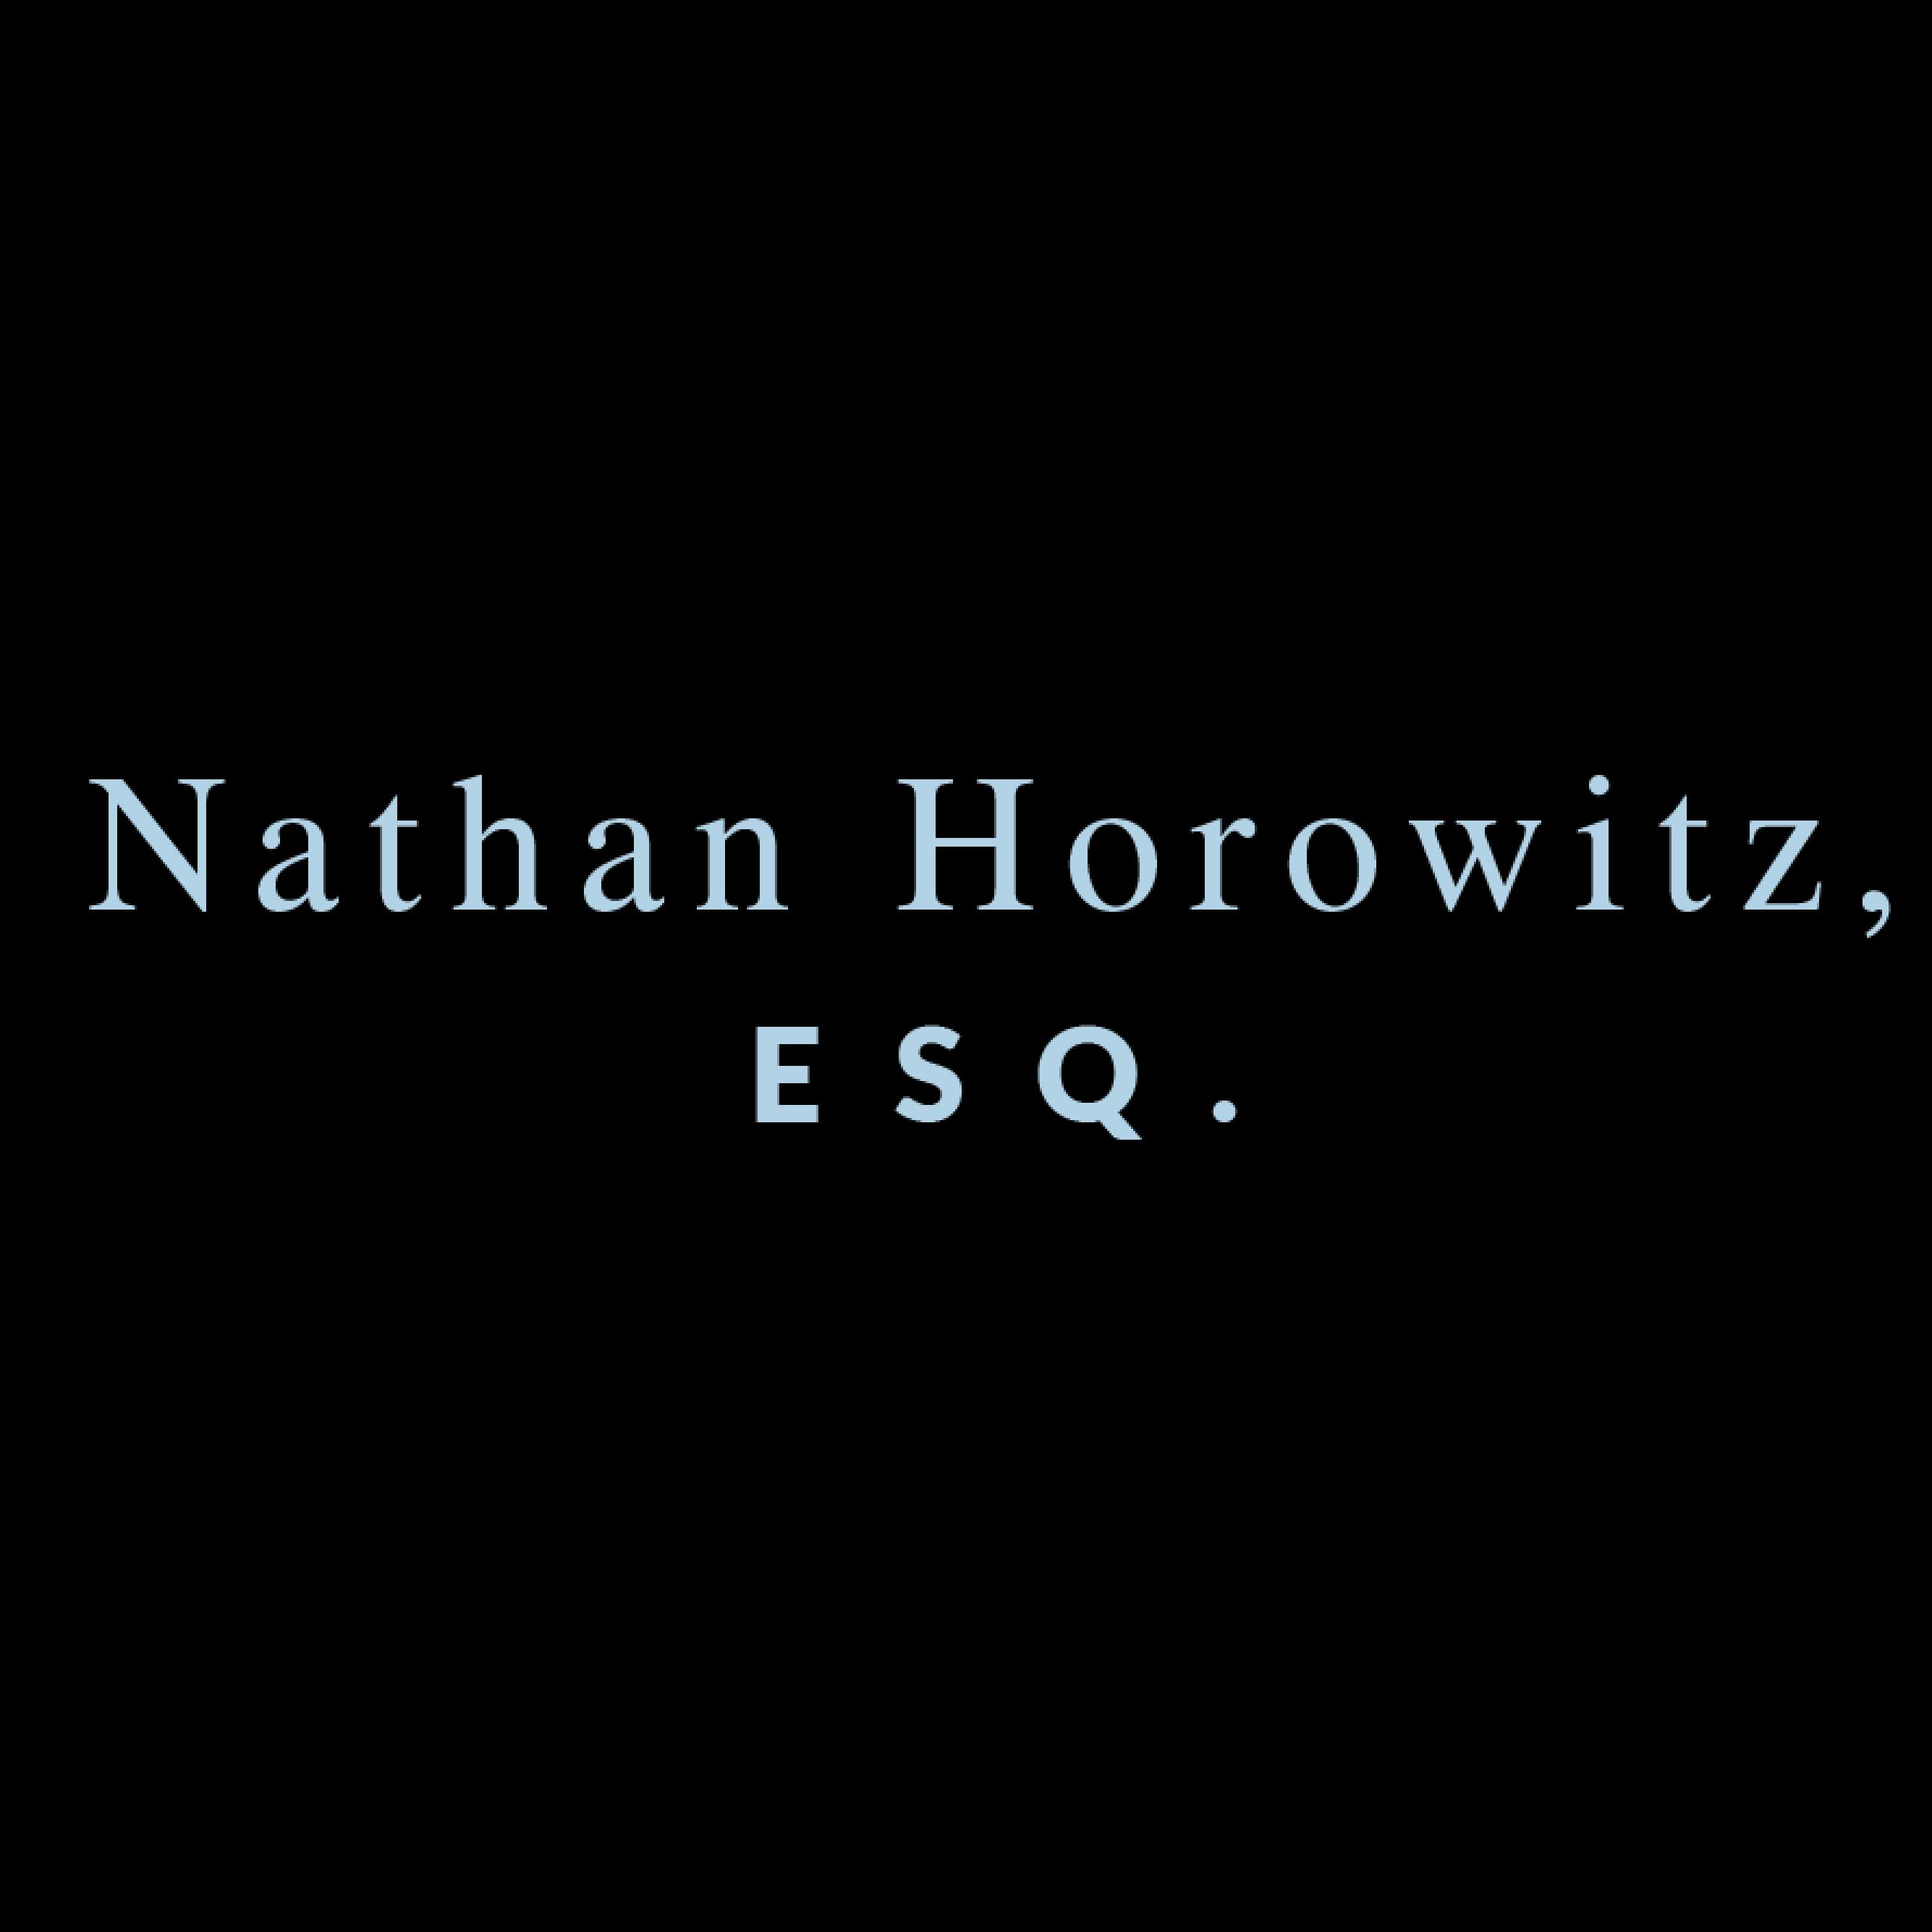 Nathan Horowitz, ESQ.